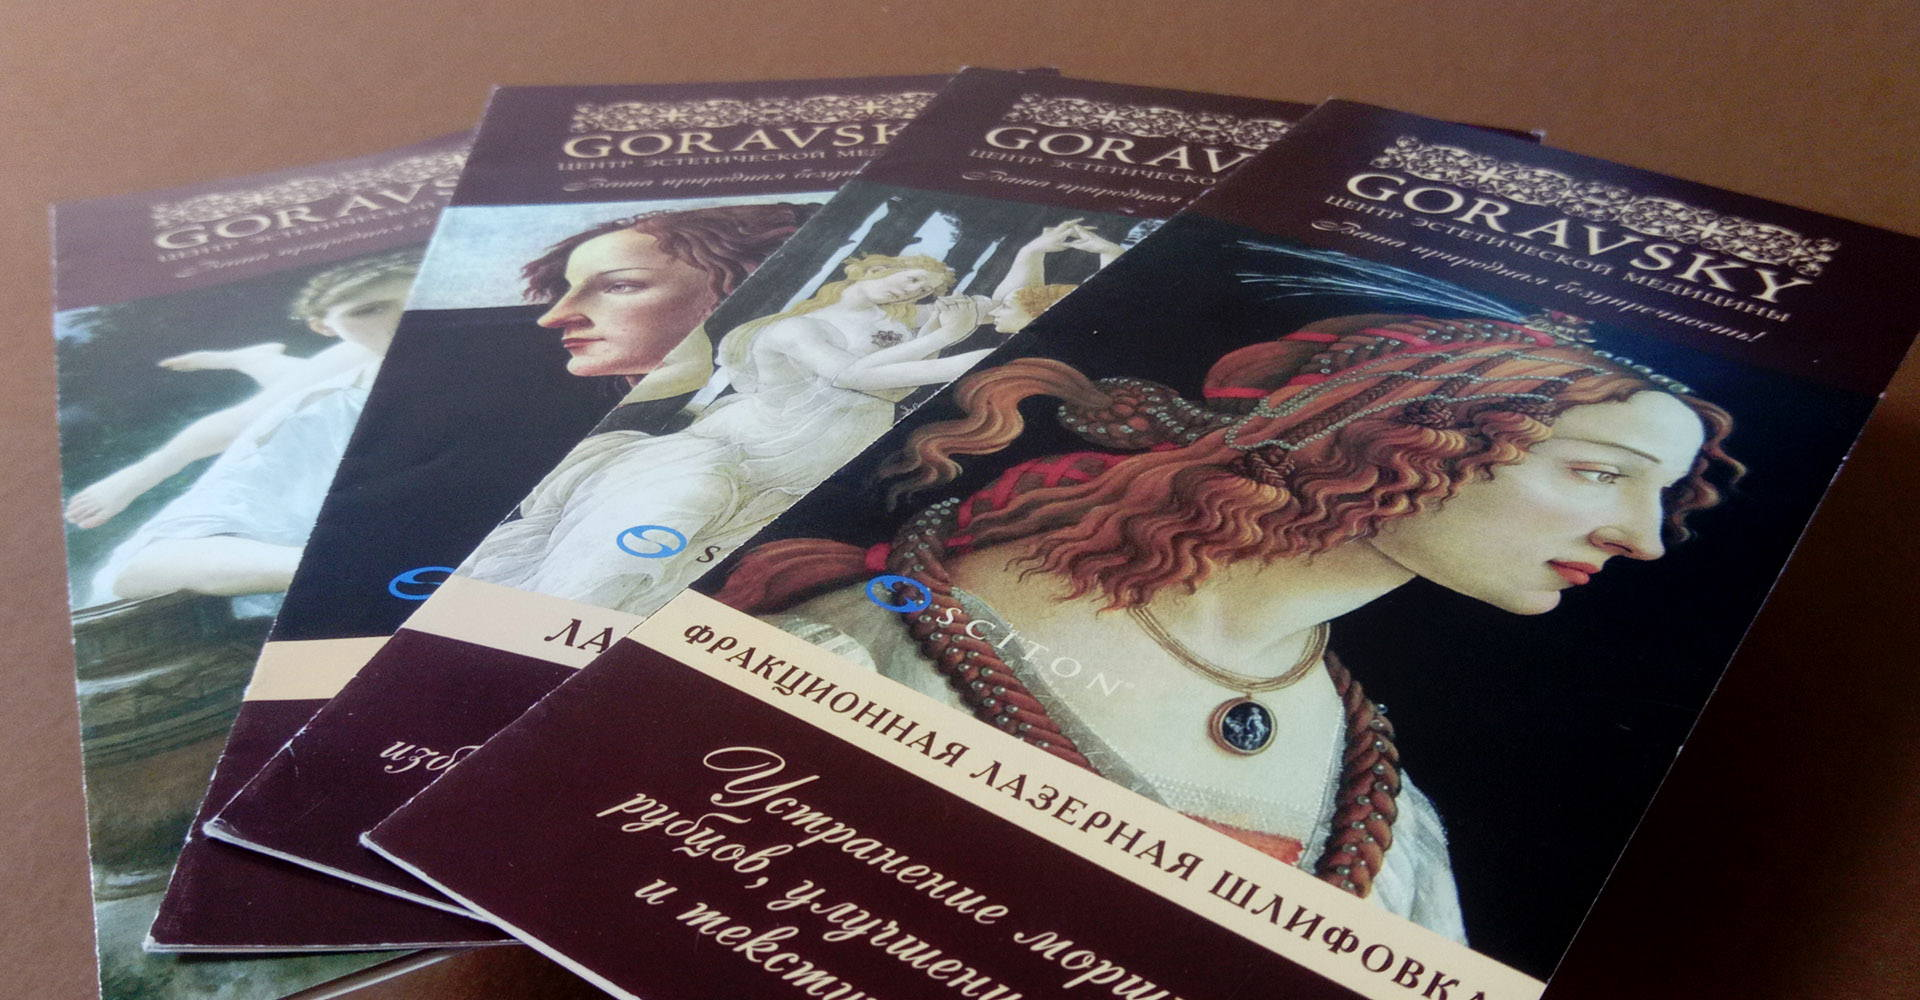 Development брошюры of the medical clinic, medical clinic brochure design